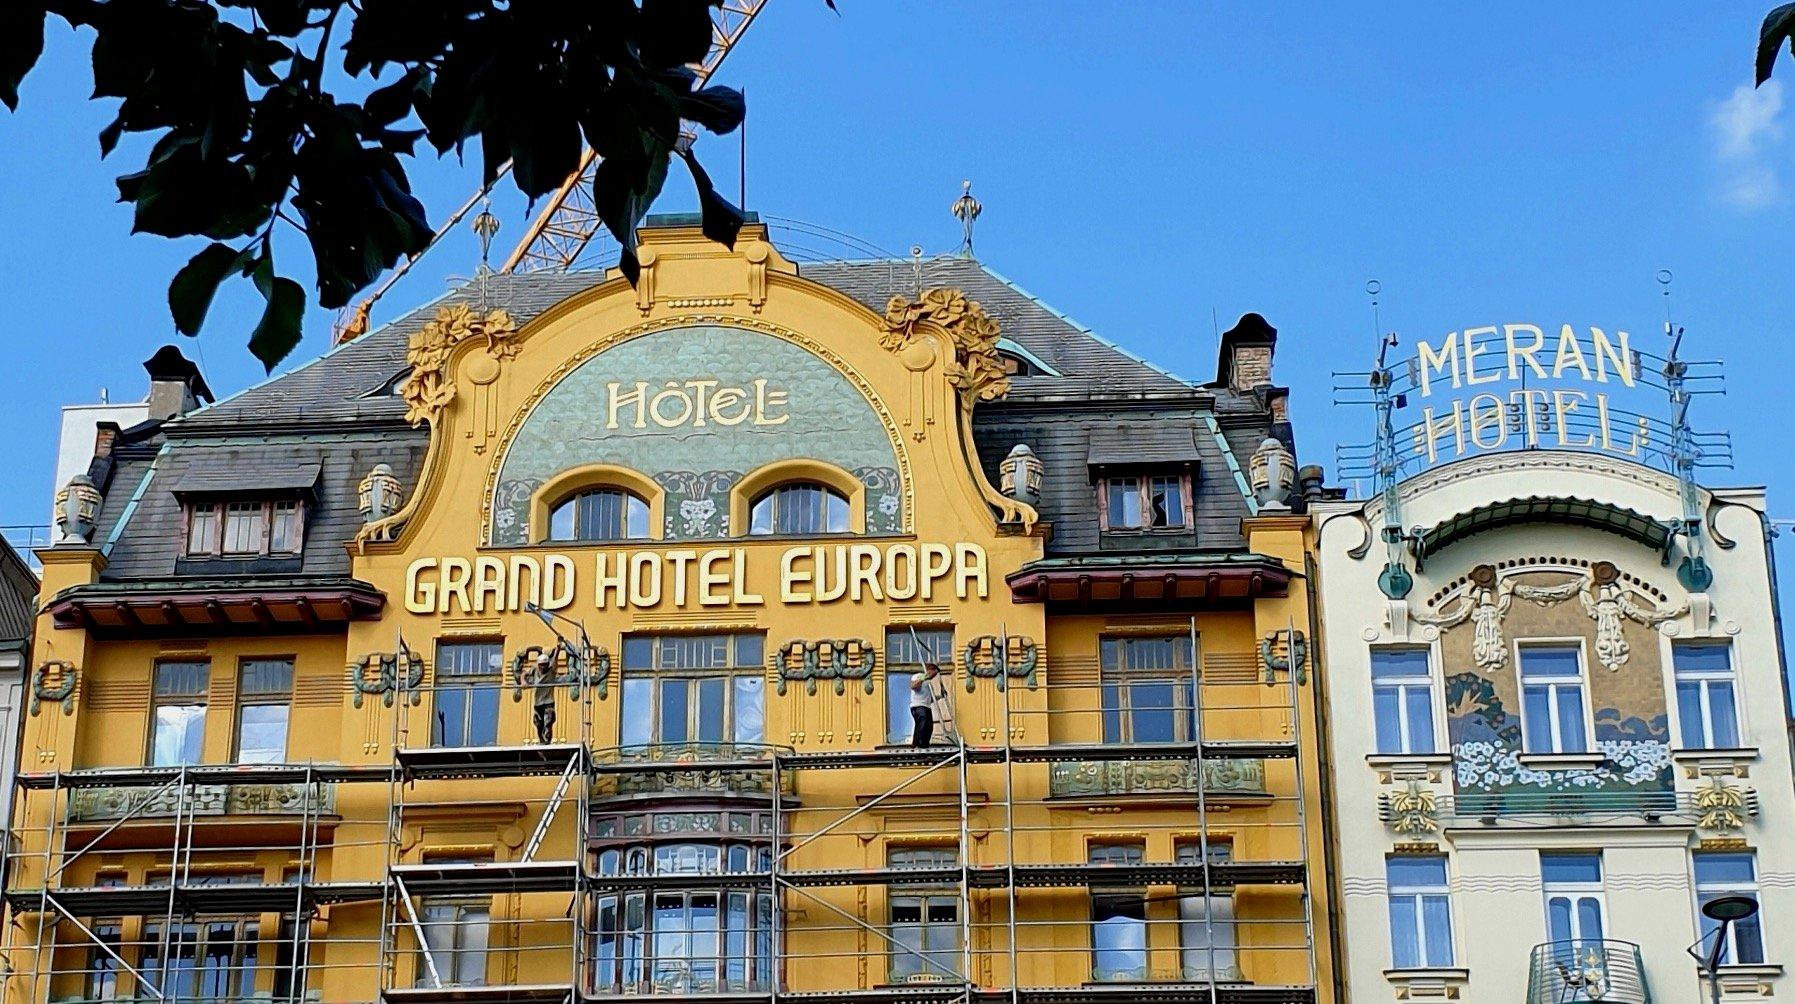 Praag Reisadvies Tsjechië citytrip Praag deze zomer